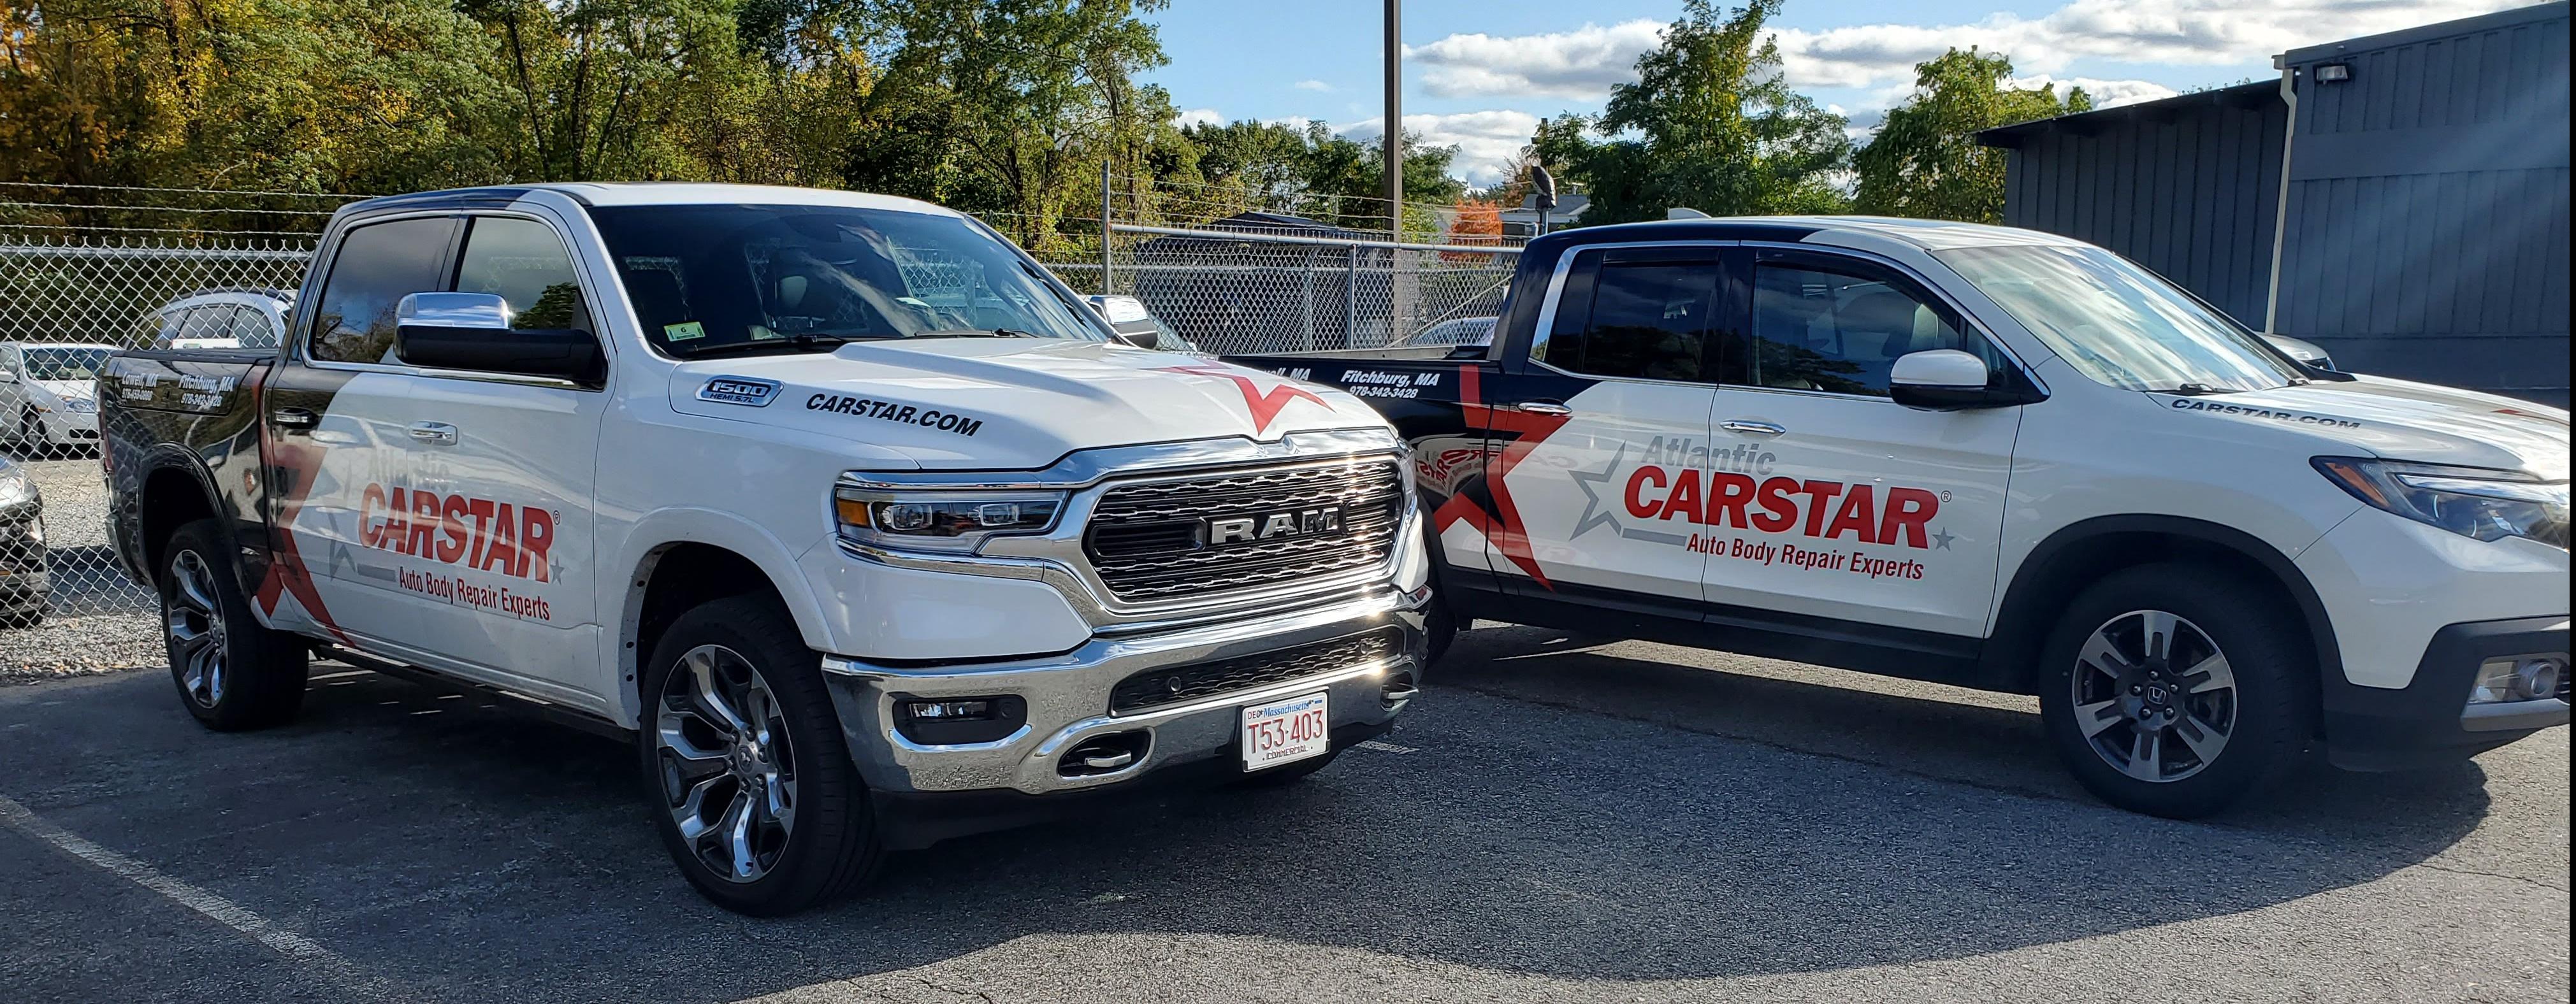 Carstar | Auto Body, Shop, Autobody, CARSTAR, Collision, Repair, Certified, ASE, I-Car